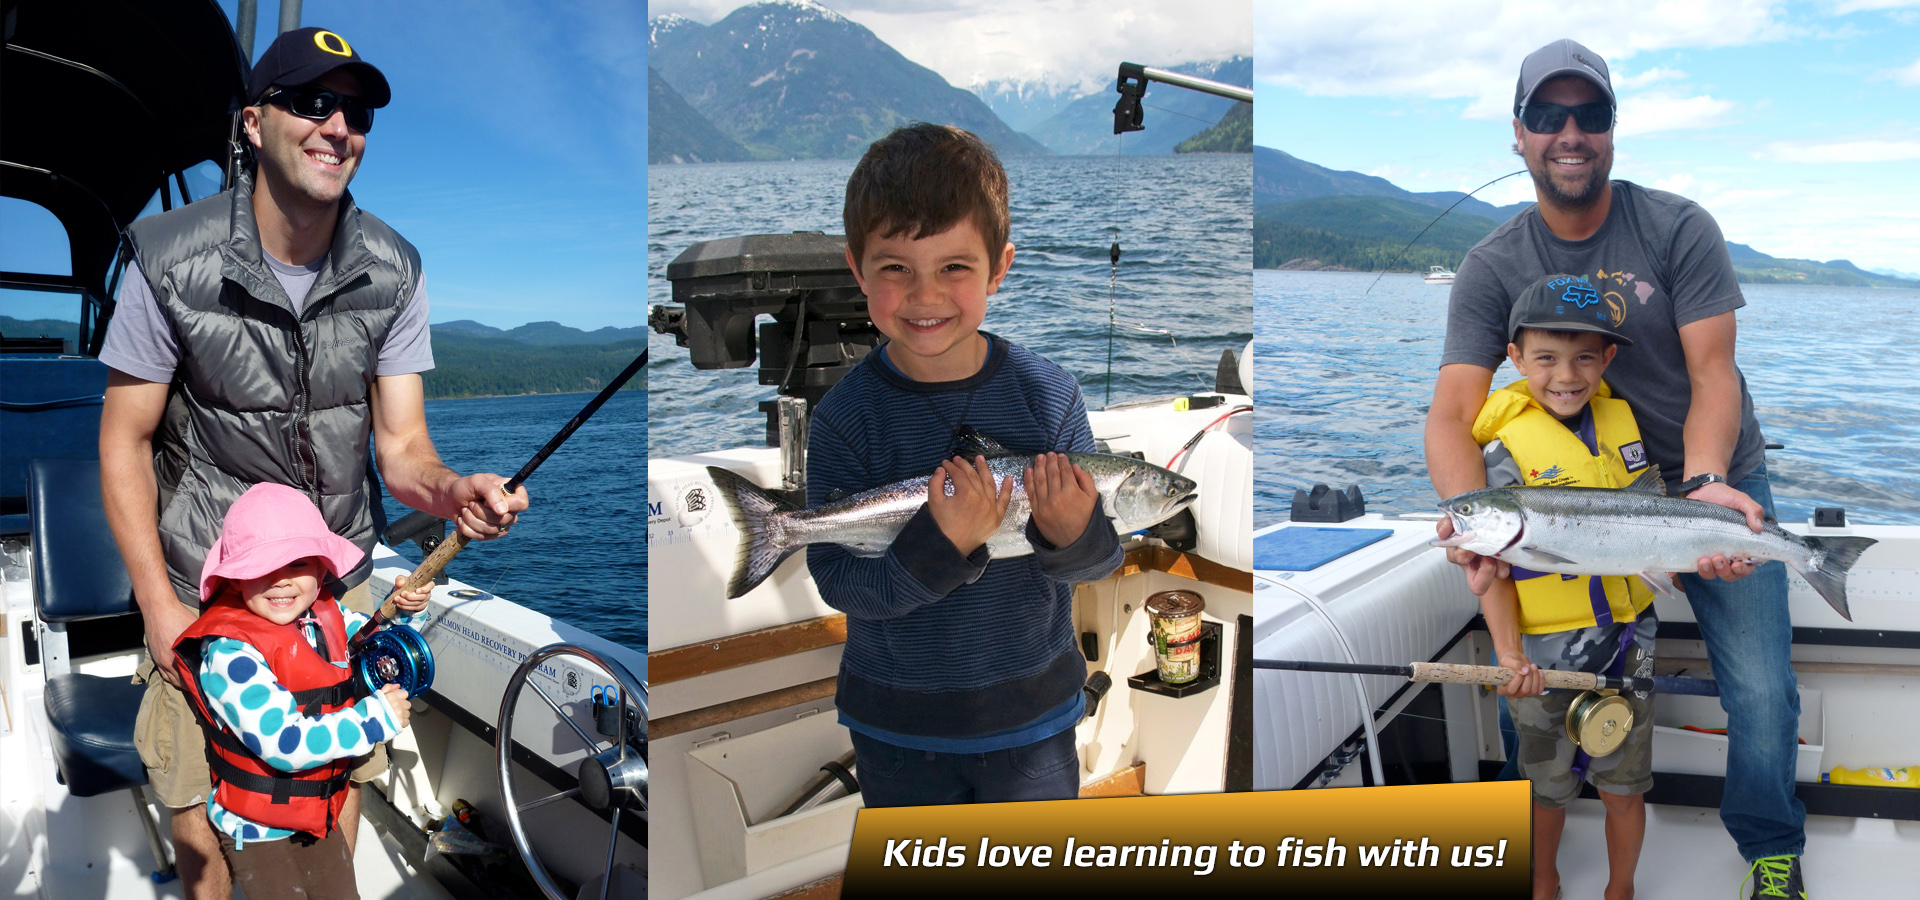 kids fish with profish